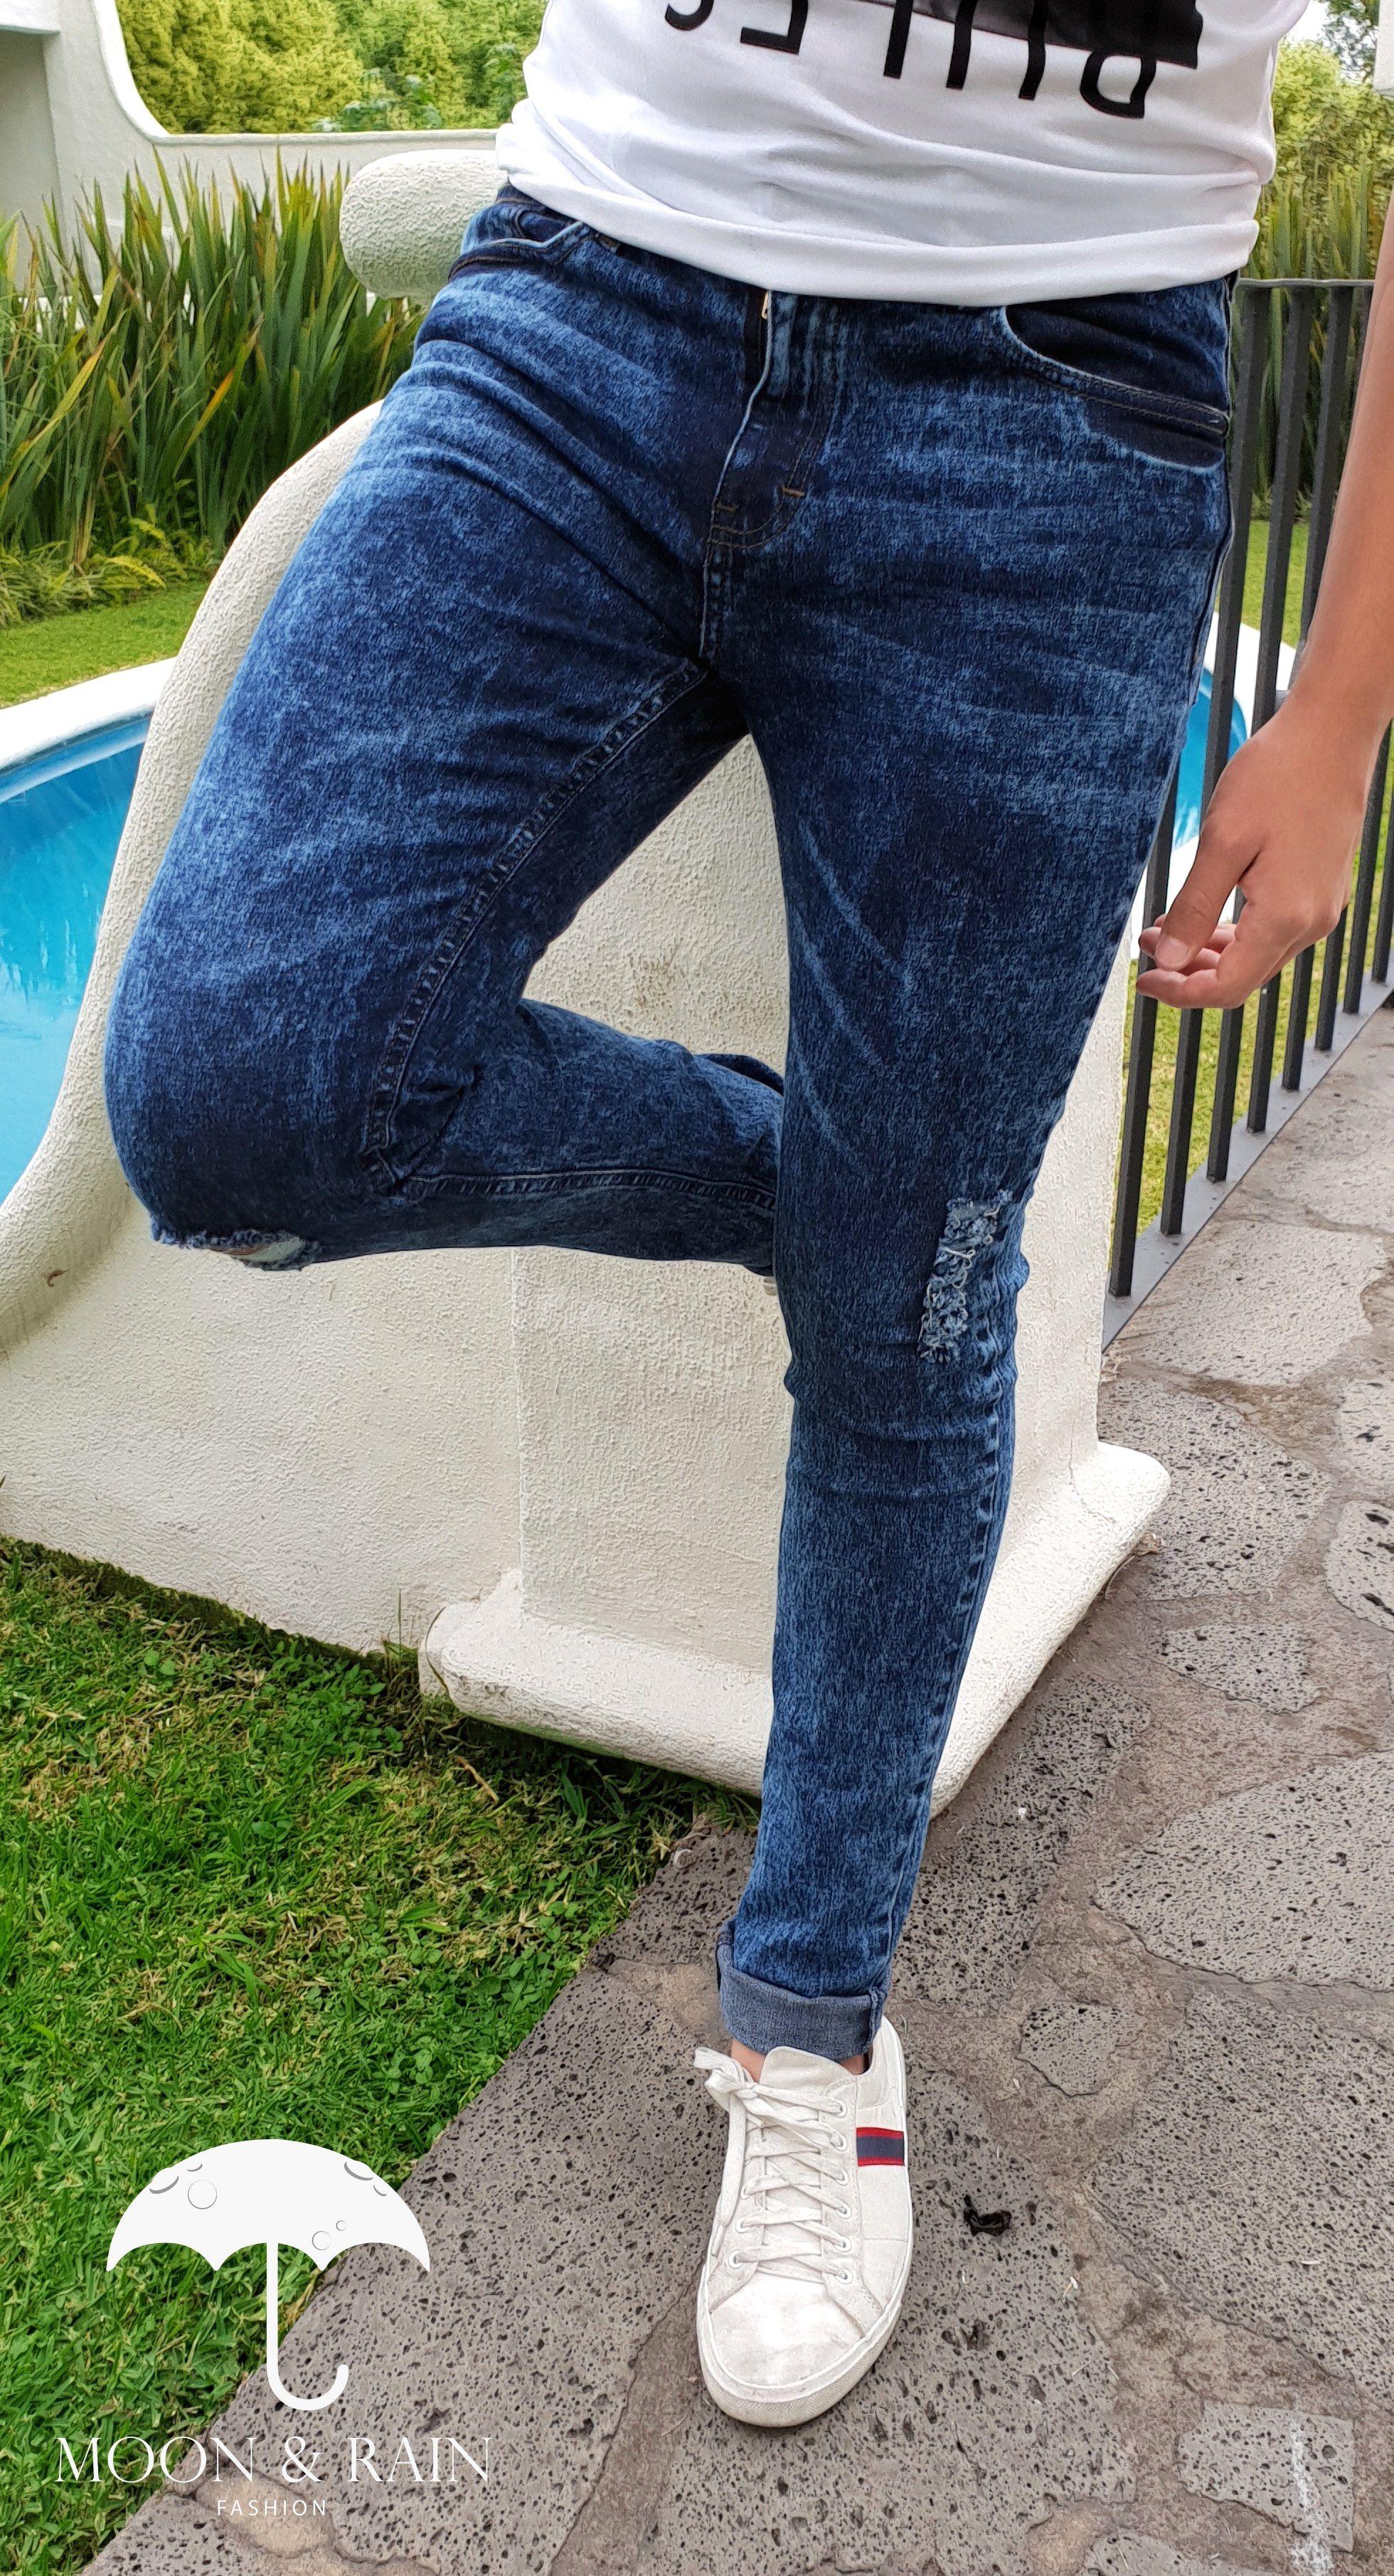 Pantalon De Mezclilla Deslavado Outfit Pantalon De Mezclilla Pantalones De Mezclilla Vestir Elegante Hombre